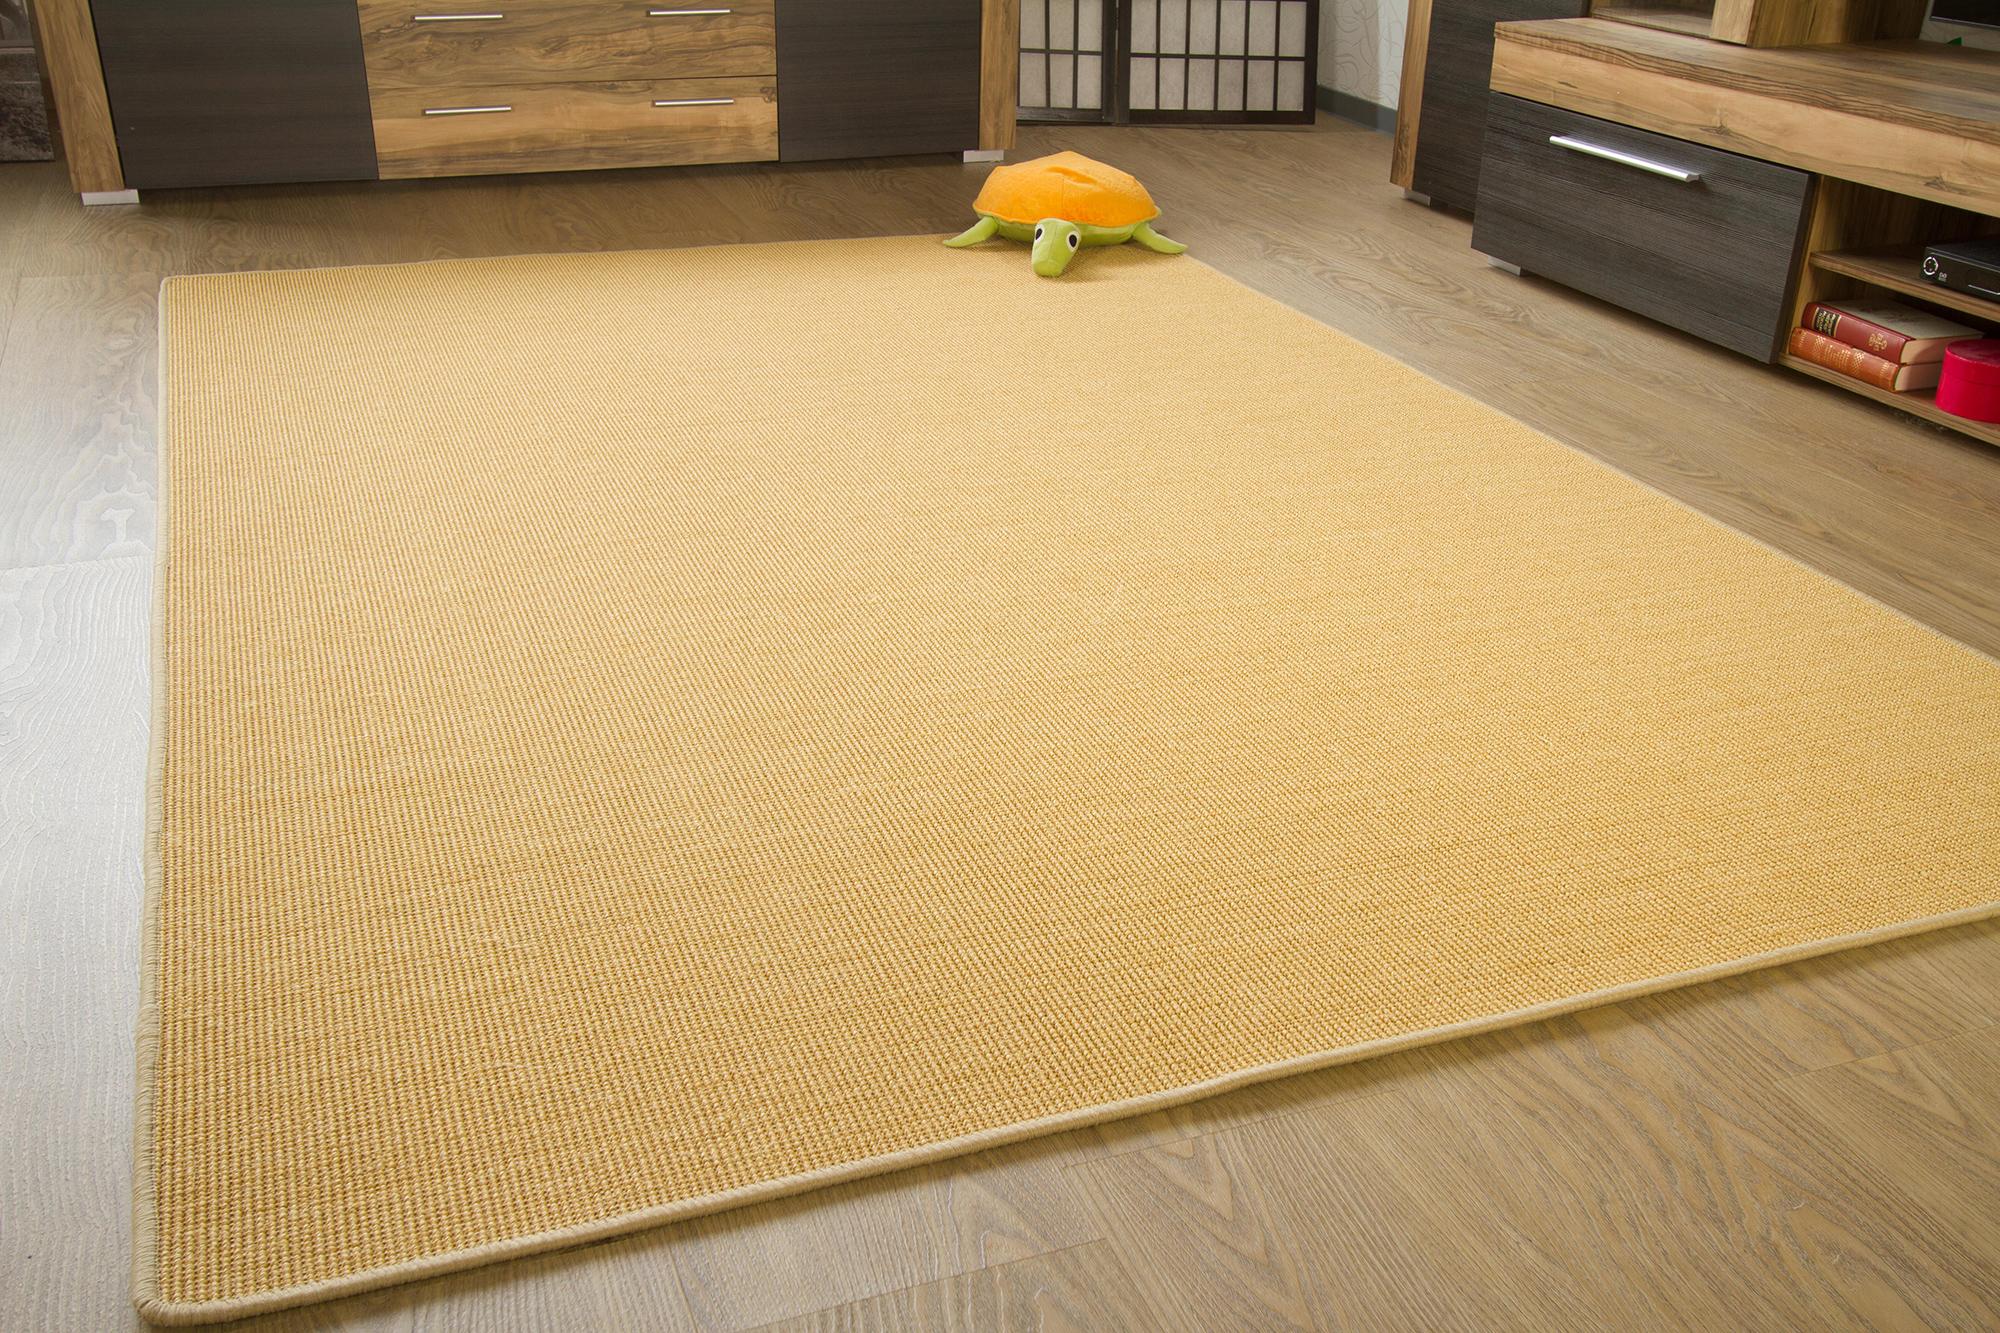 100 natural sisal rug acapulco whipped border antislip. Black Bedroom Furniture Sets. Home Design Ideas